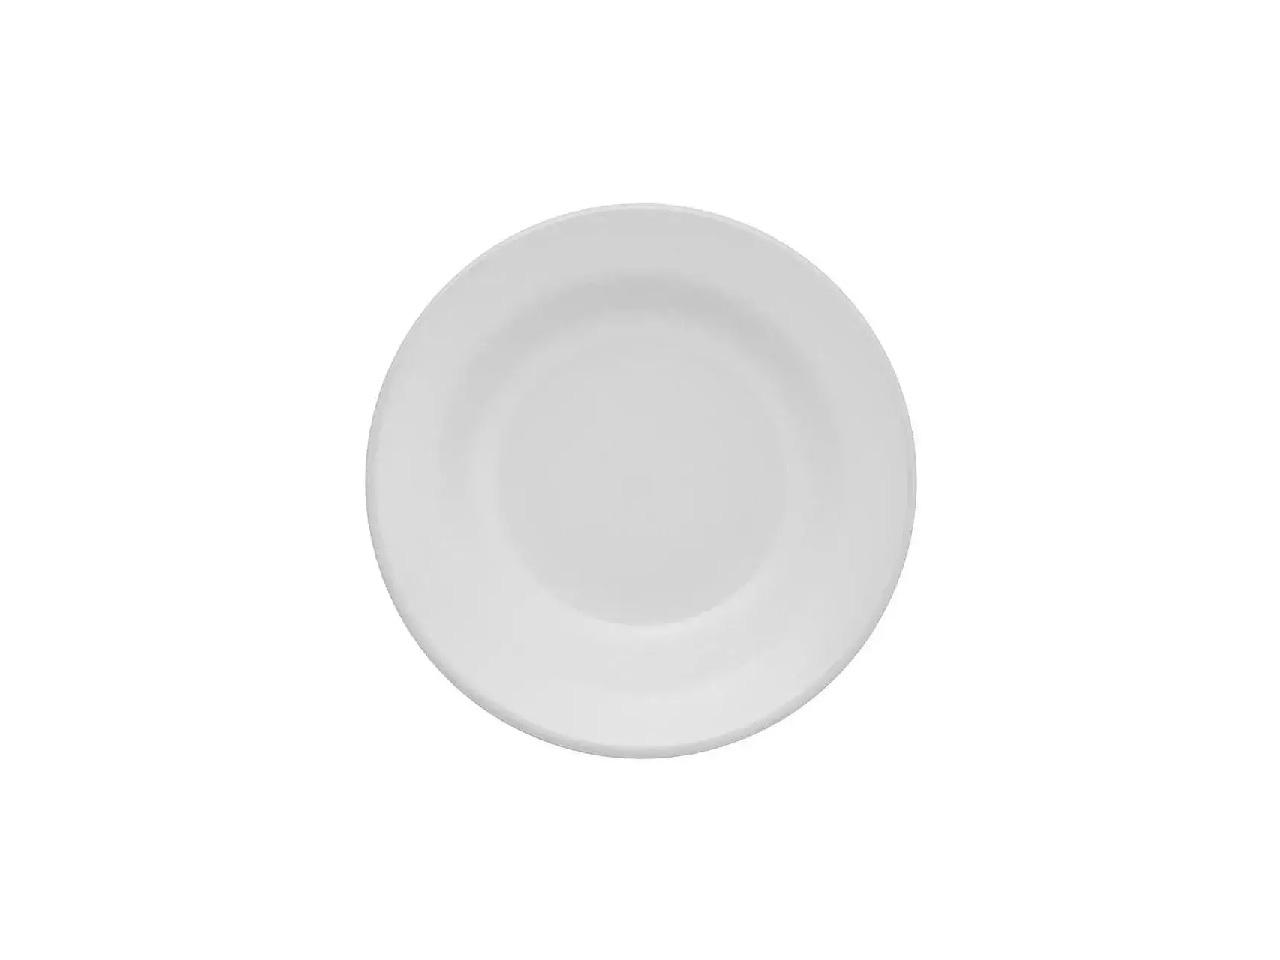 Prato Raso Branco